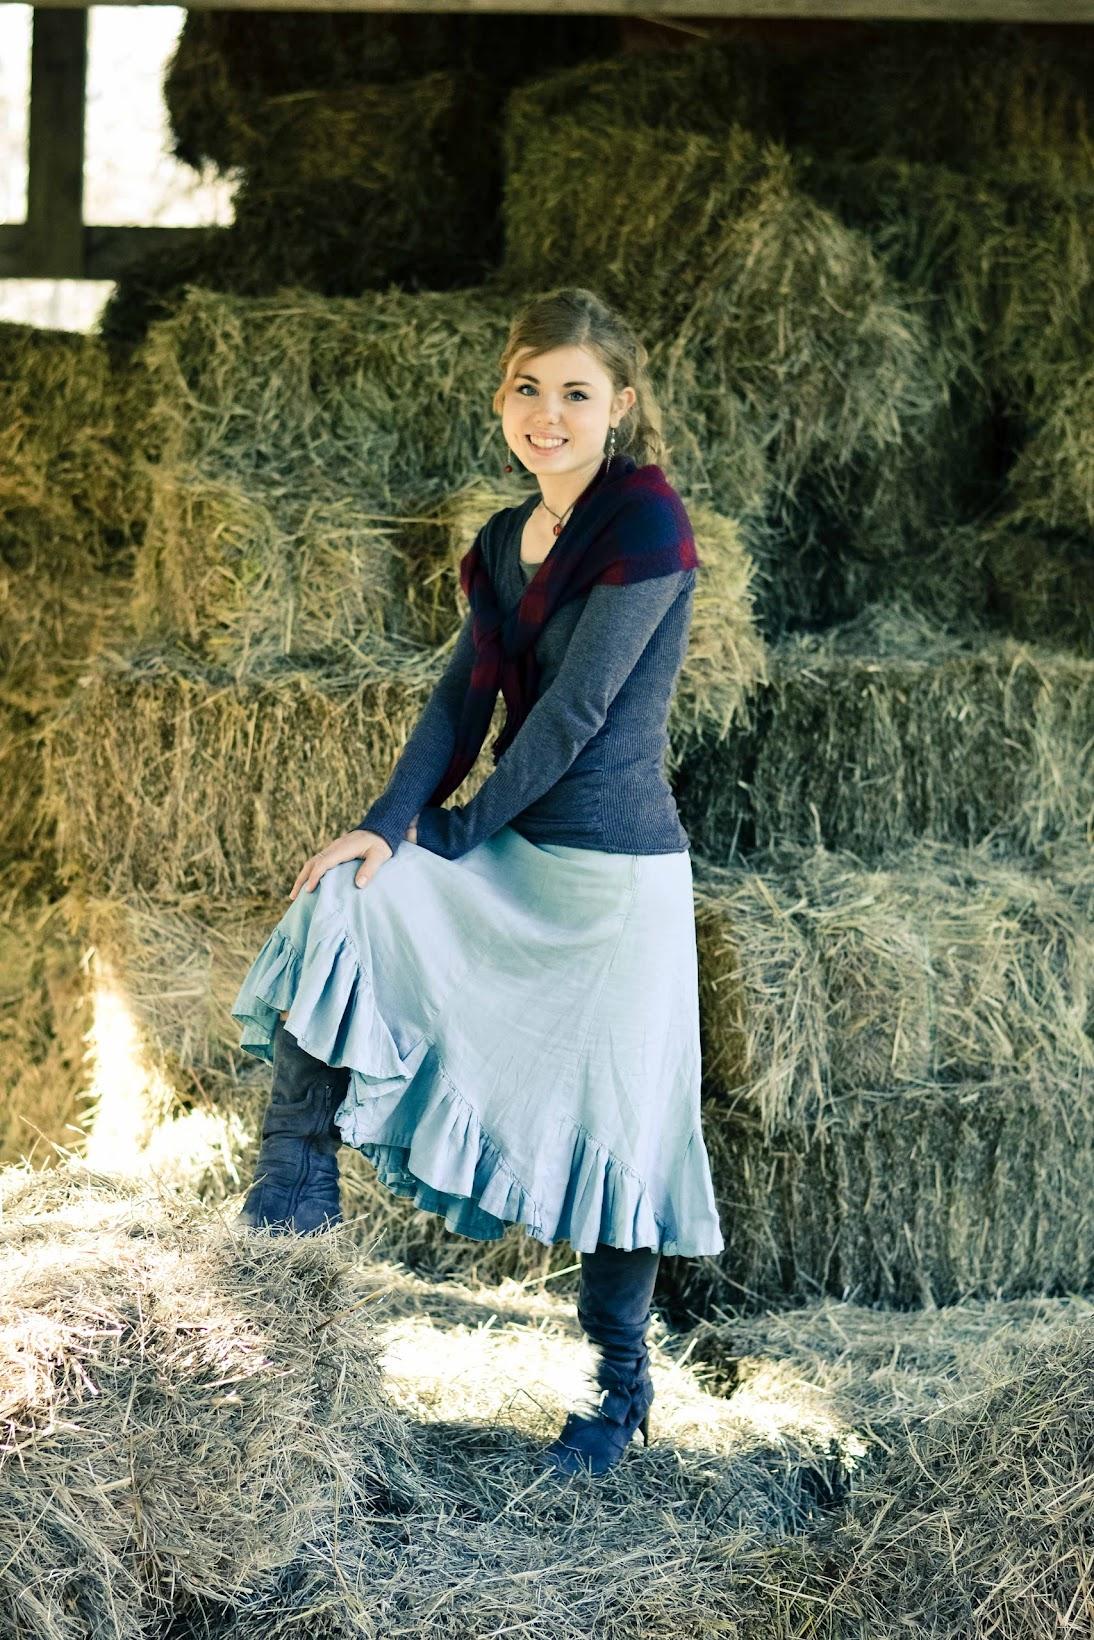 Bramblewood Fashion | Modest Fashion & Beauty Blog: Guest